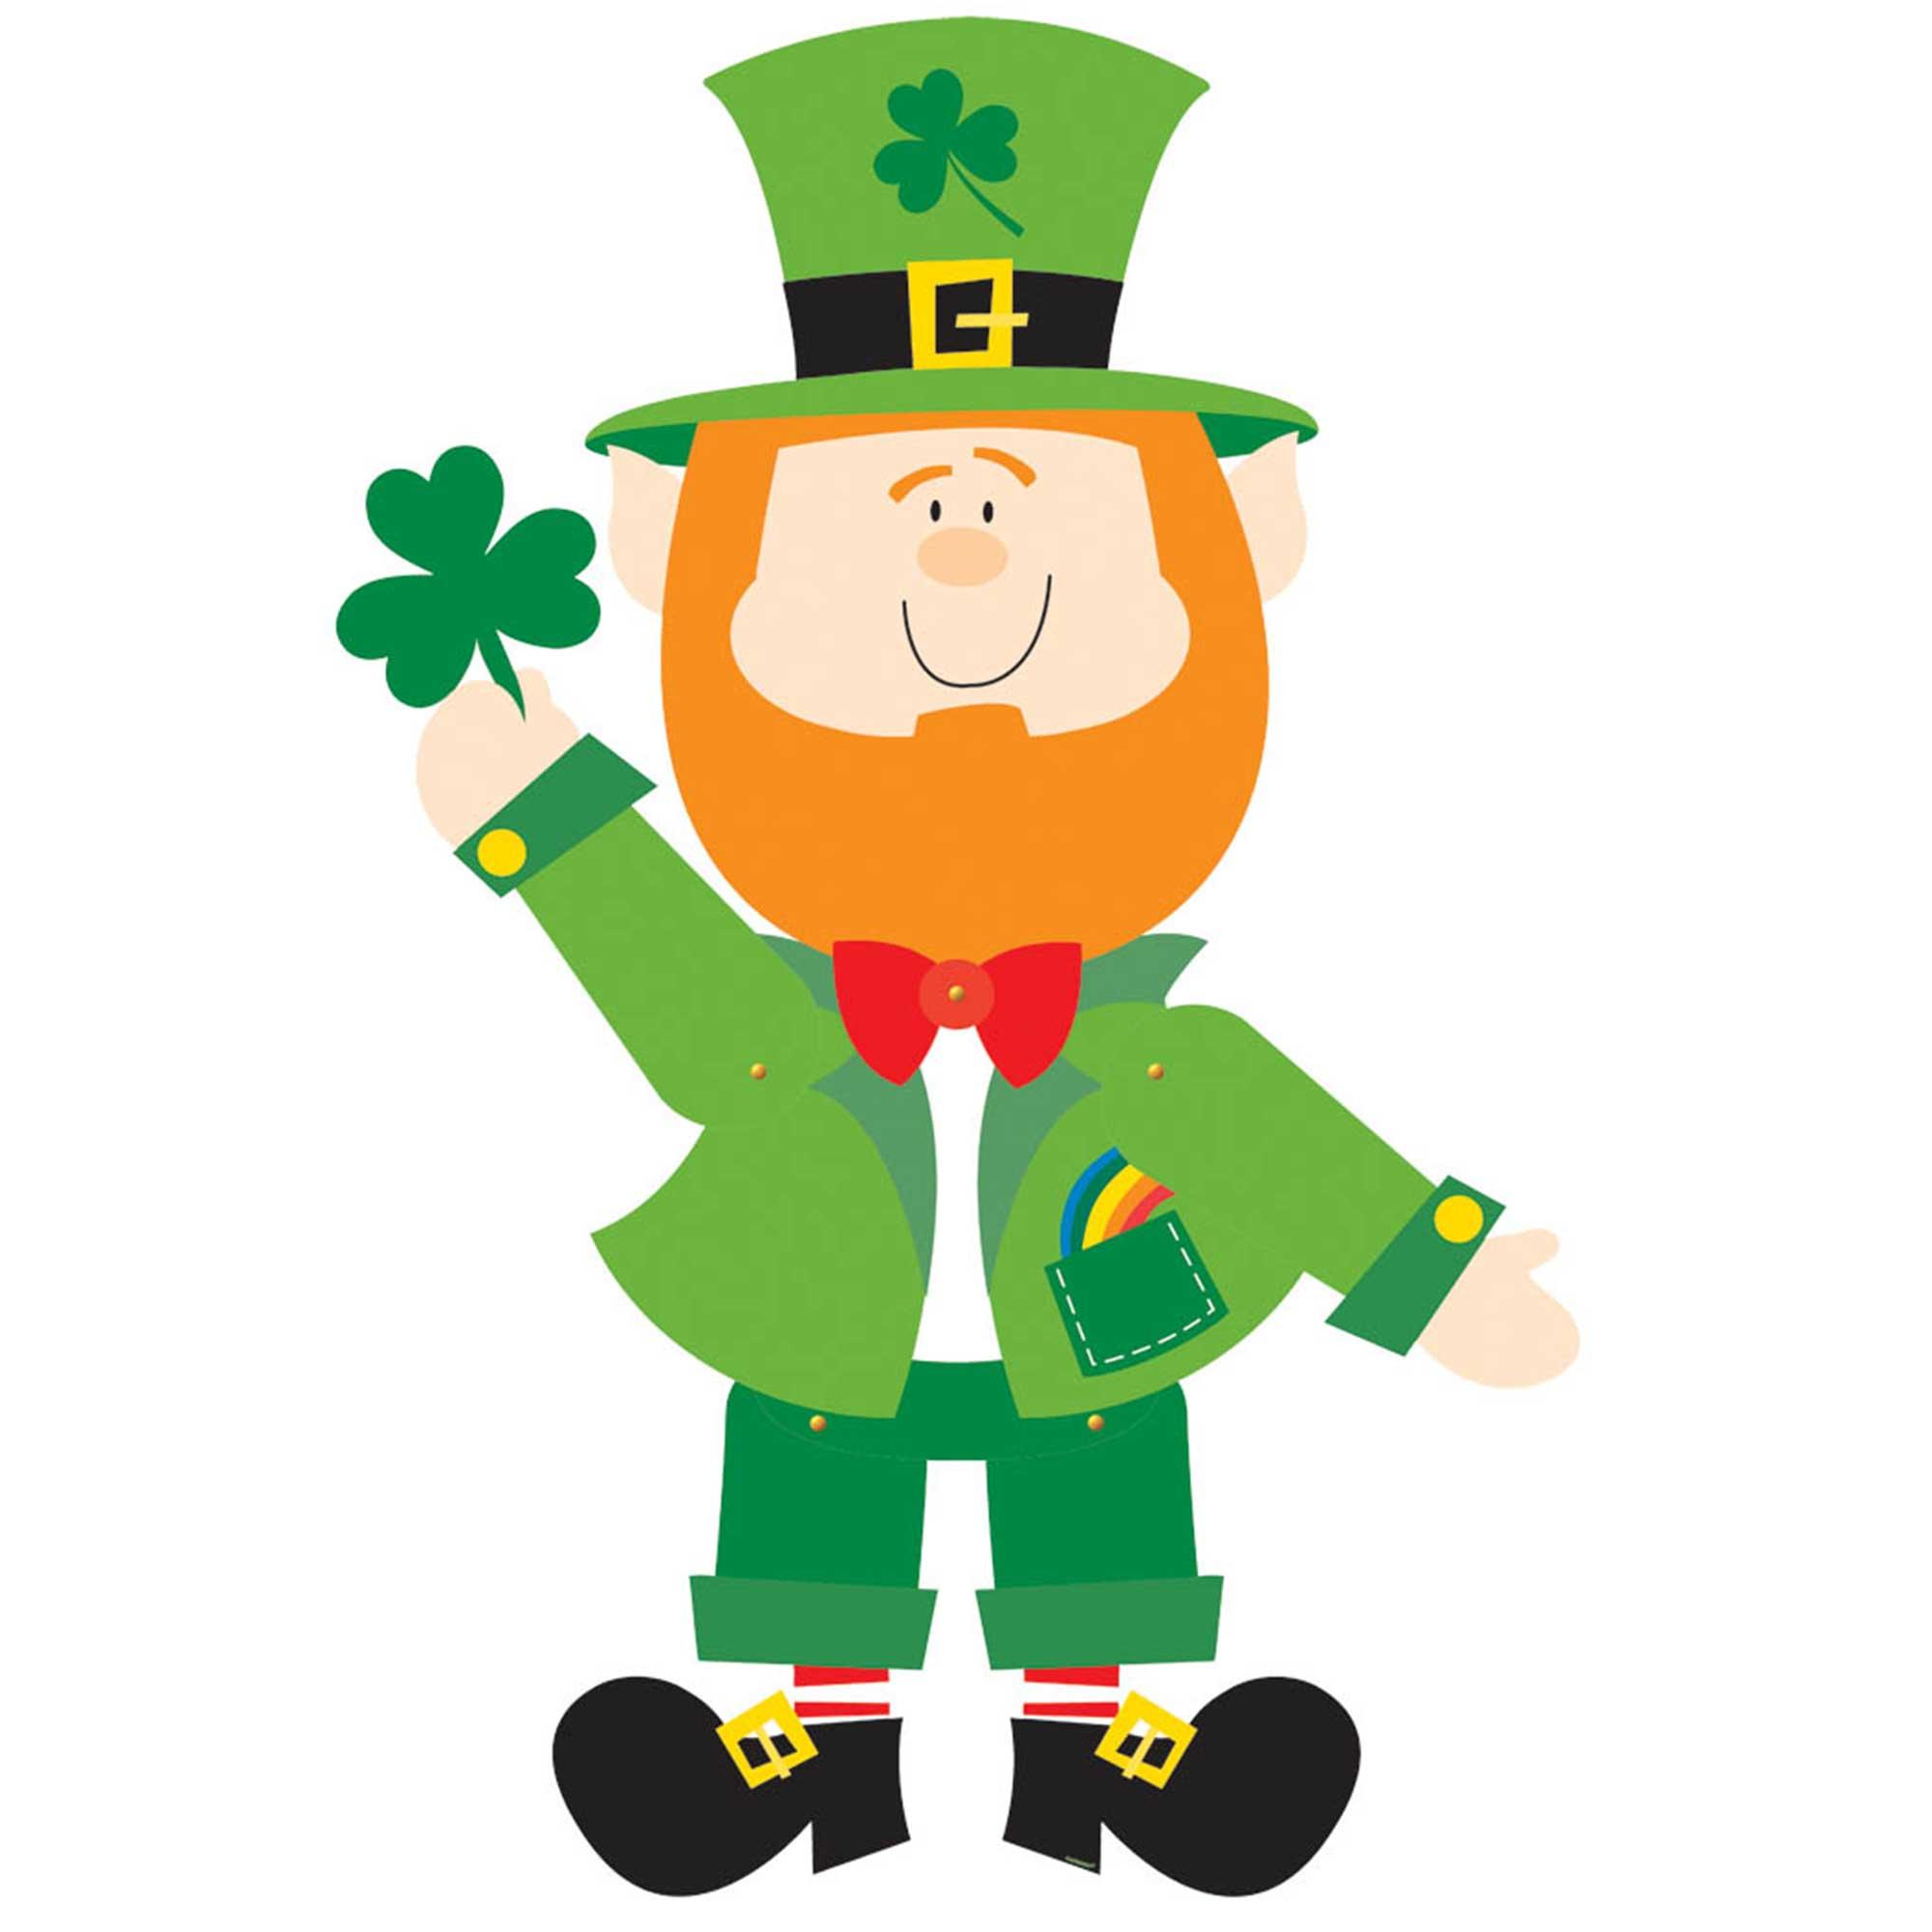 St Patrick's Day Leprechaun Jointed Cutout